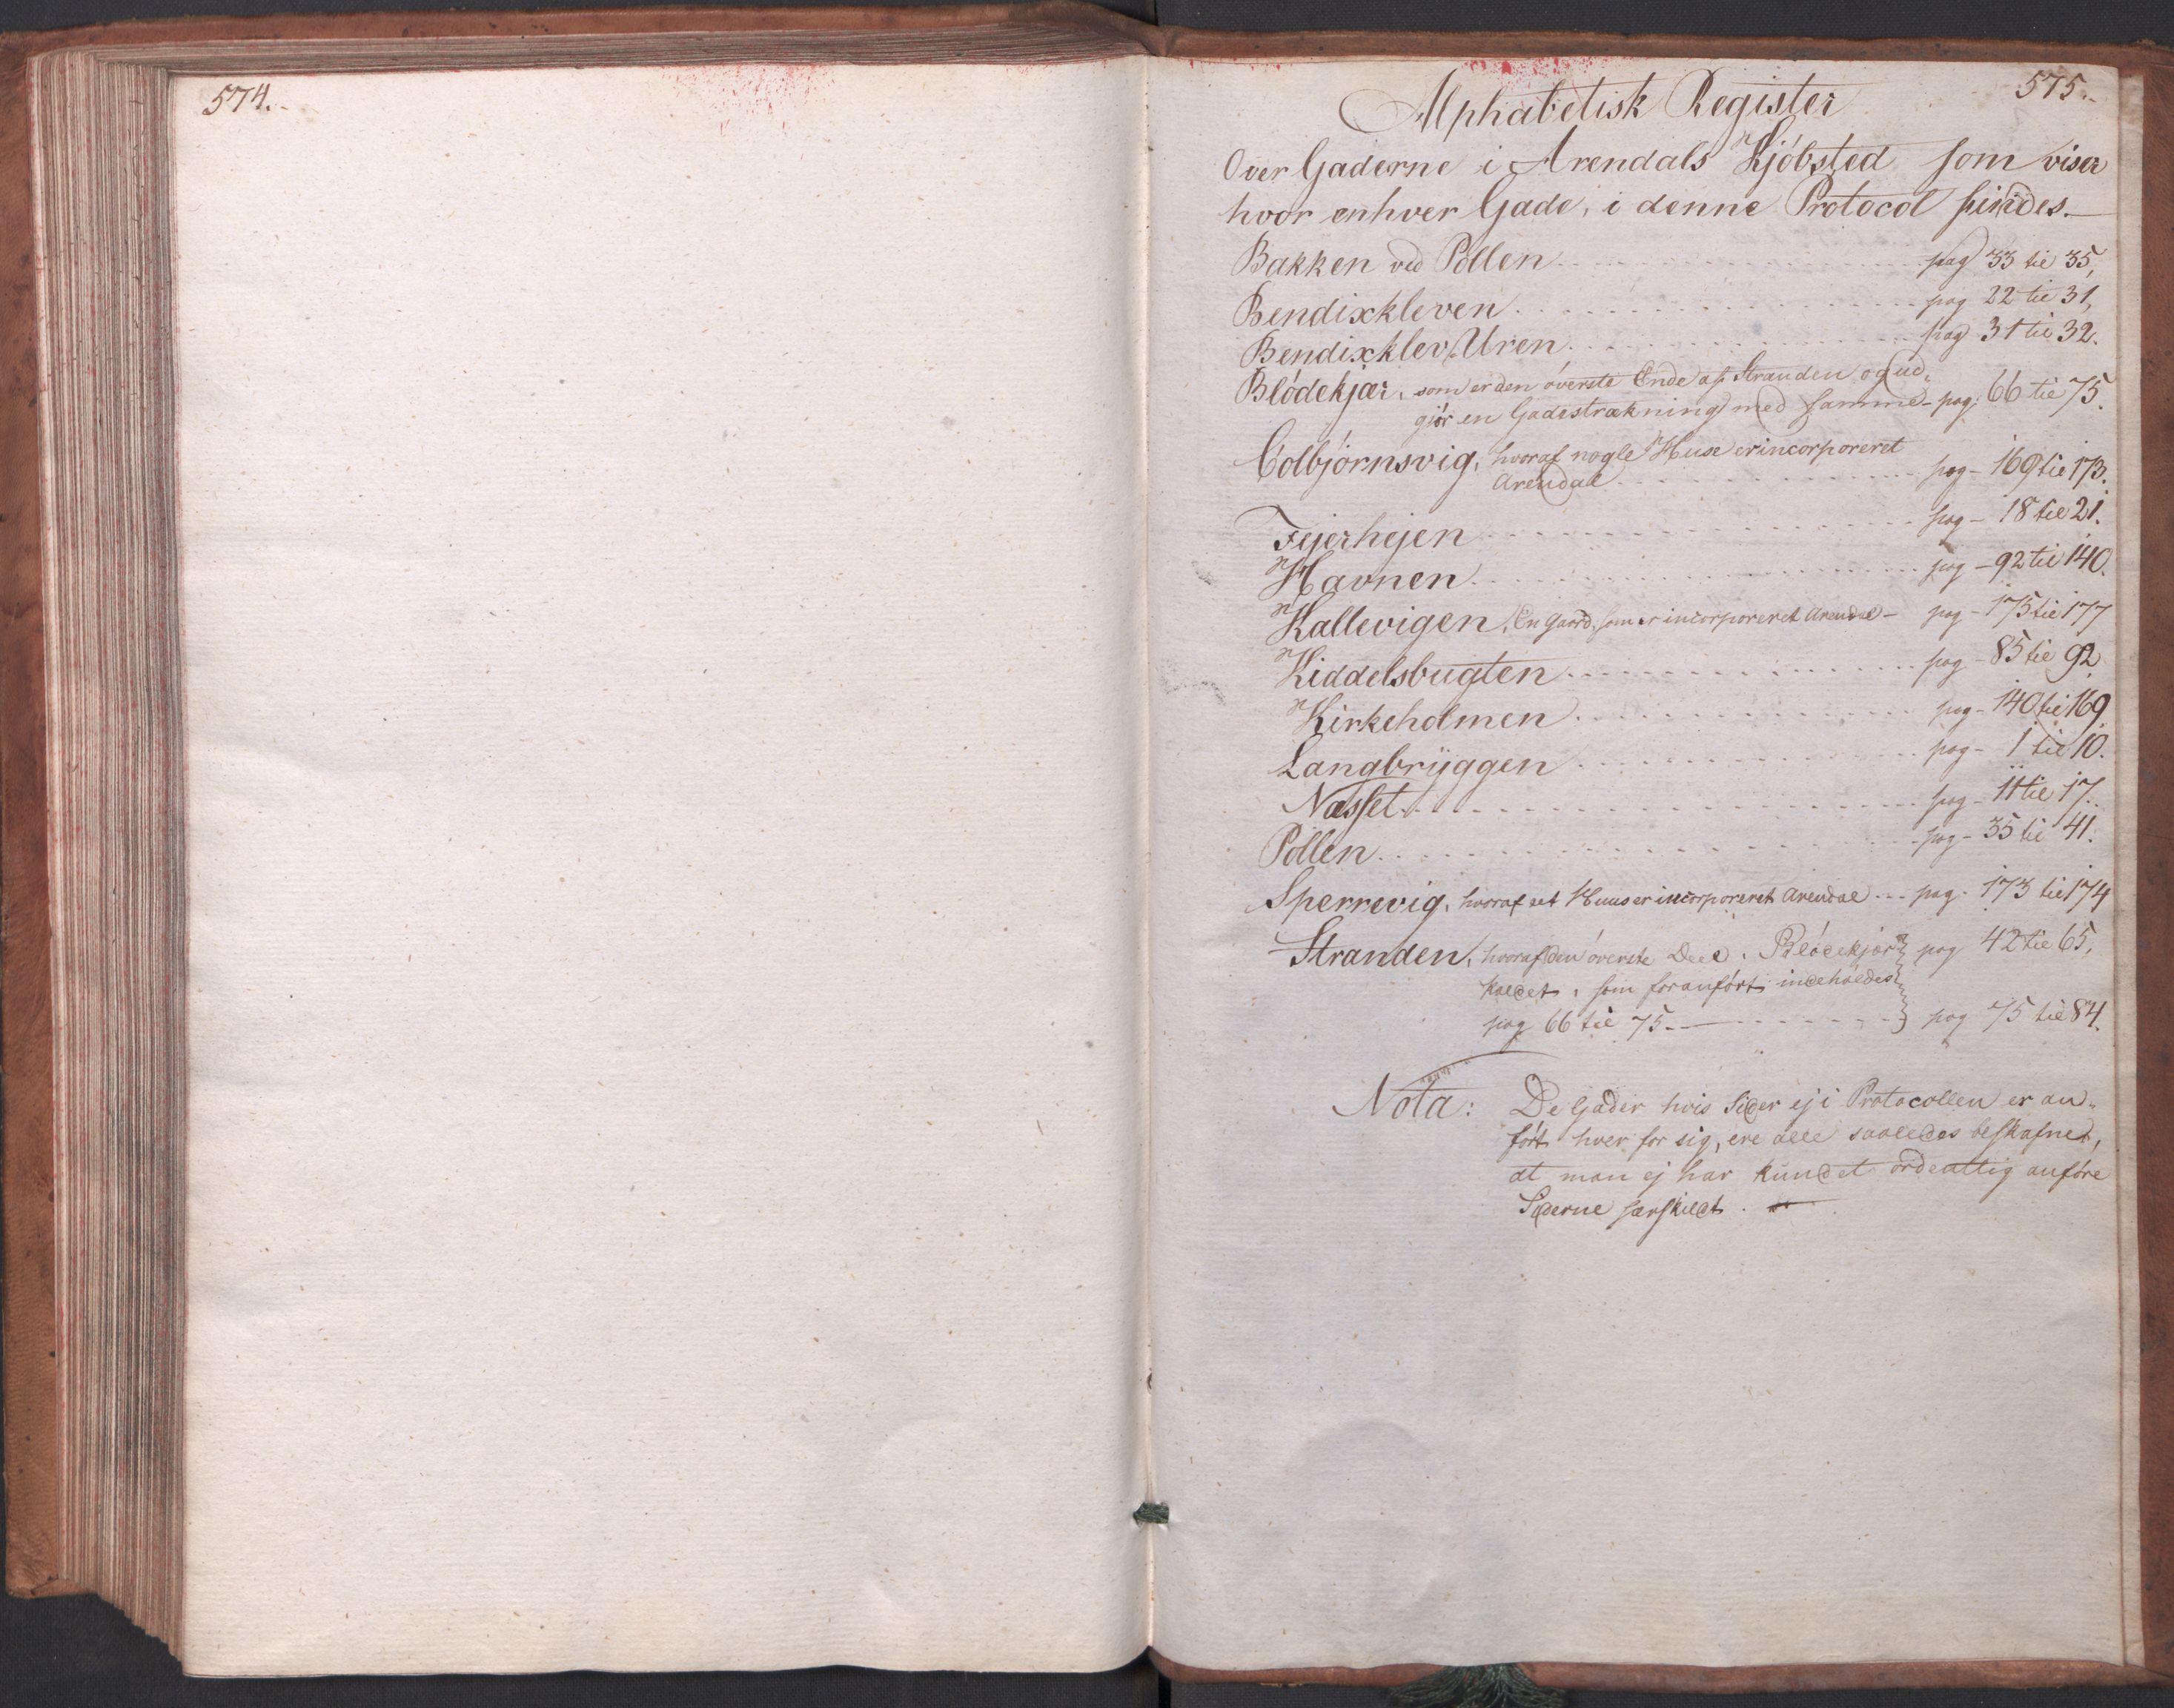 RA, Kommersekollegiet, Brannforsikringskontoret 1767-1814, F/Fa/L0003: Arendal, 1807-1817, p. 574-575